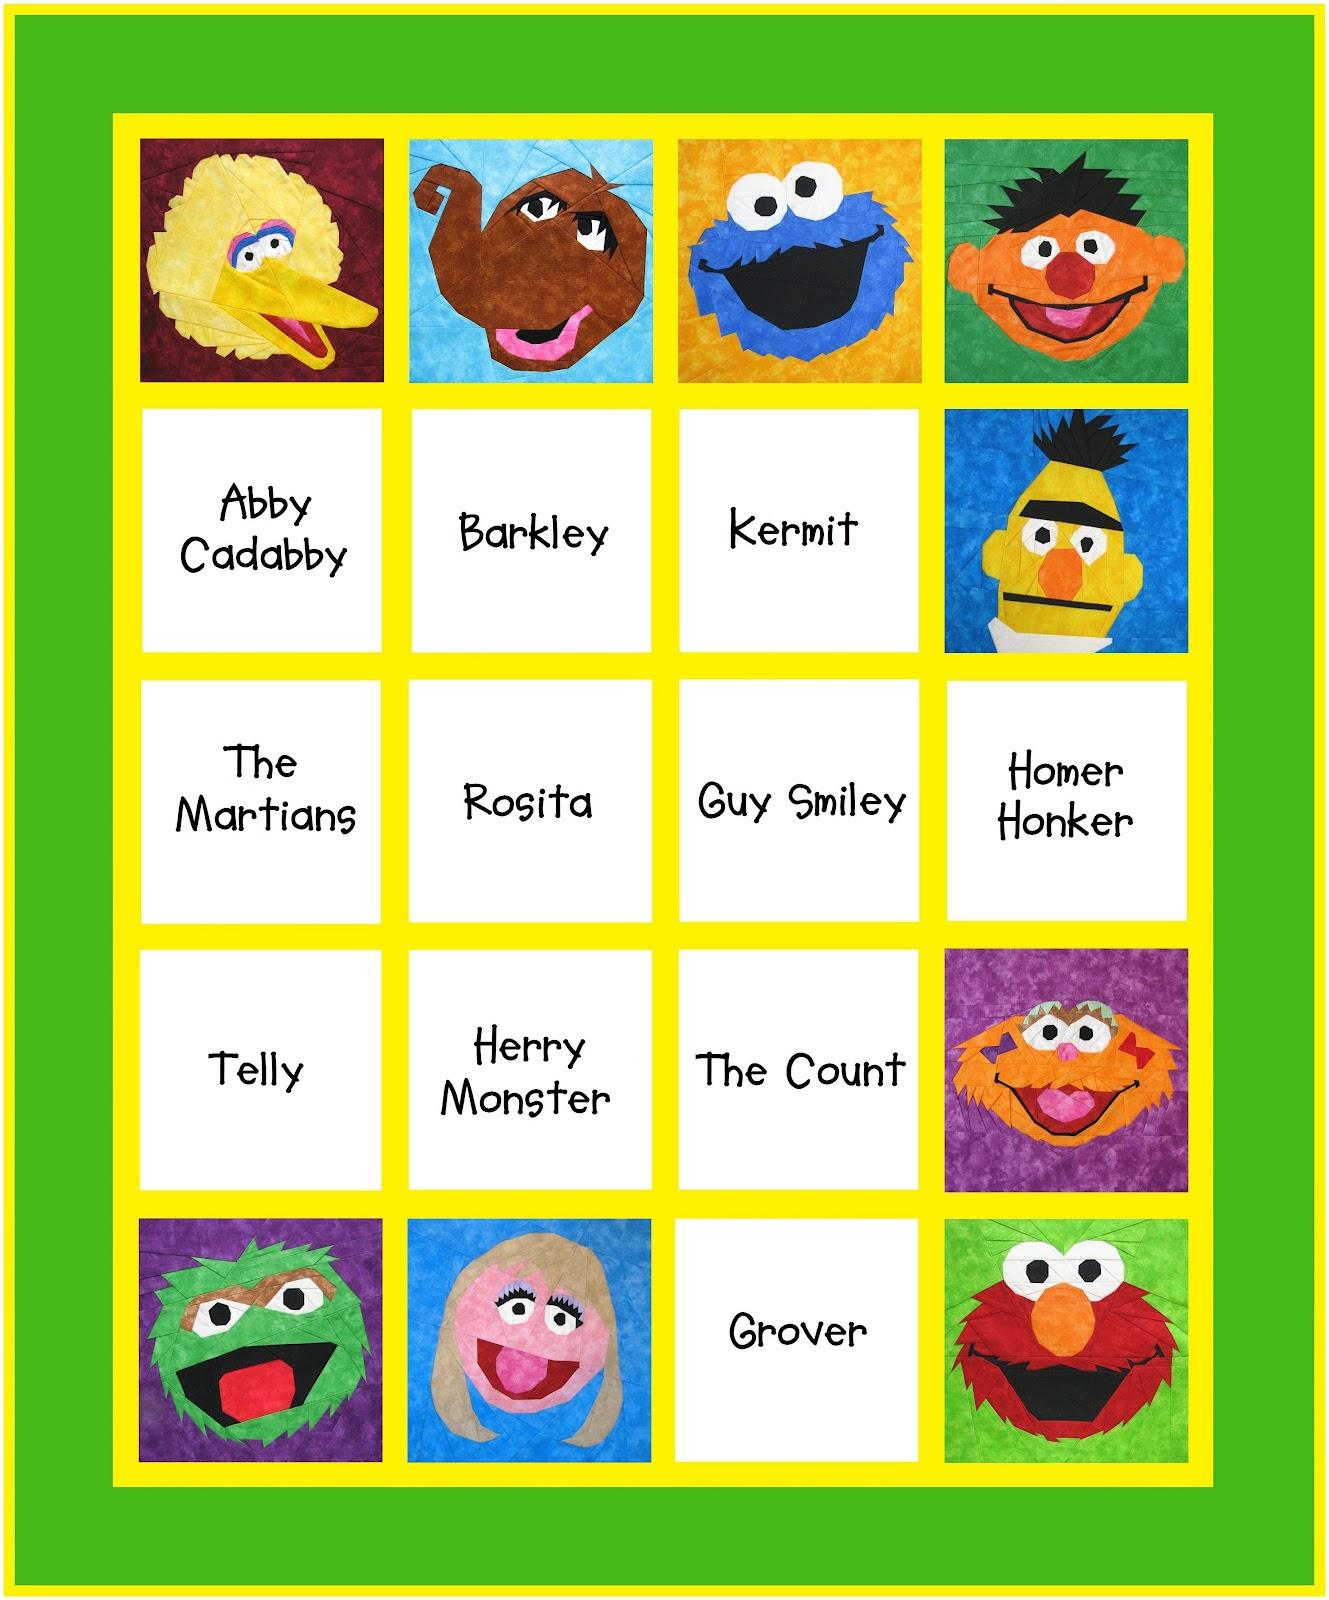 Names And Pics Of Sesame Street Characters - impremedia.net